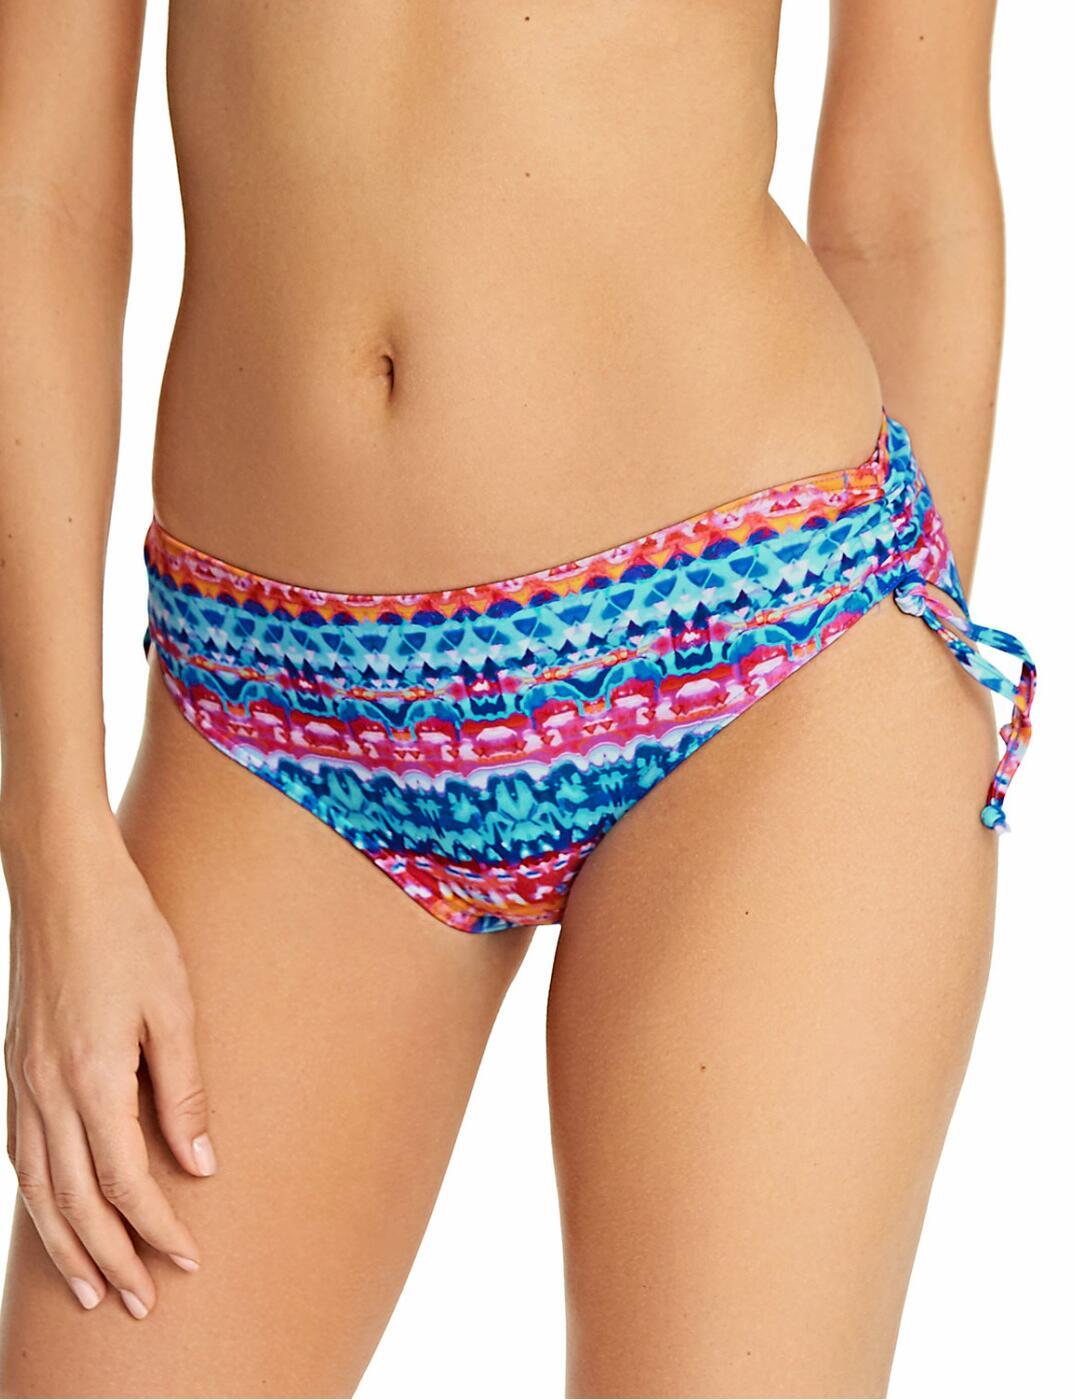 4037 Freya Cuban Crush Bikini Brief - 4037 Multi